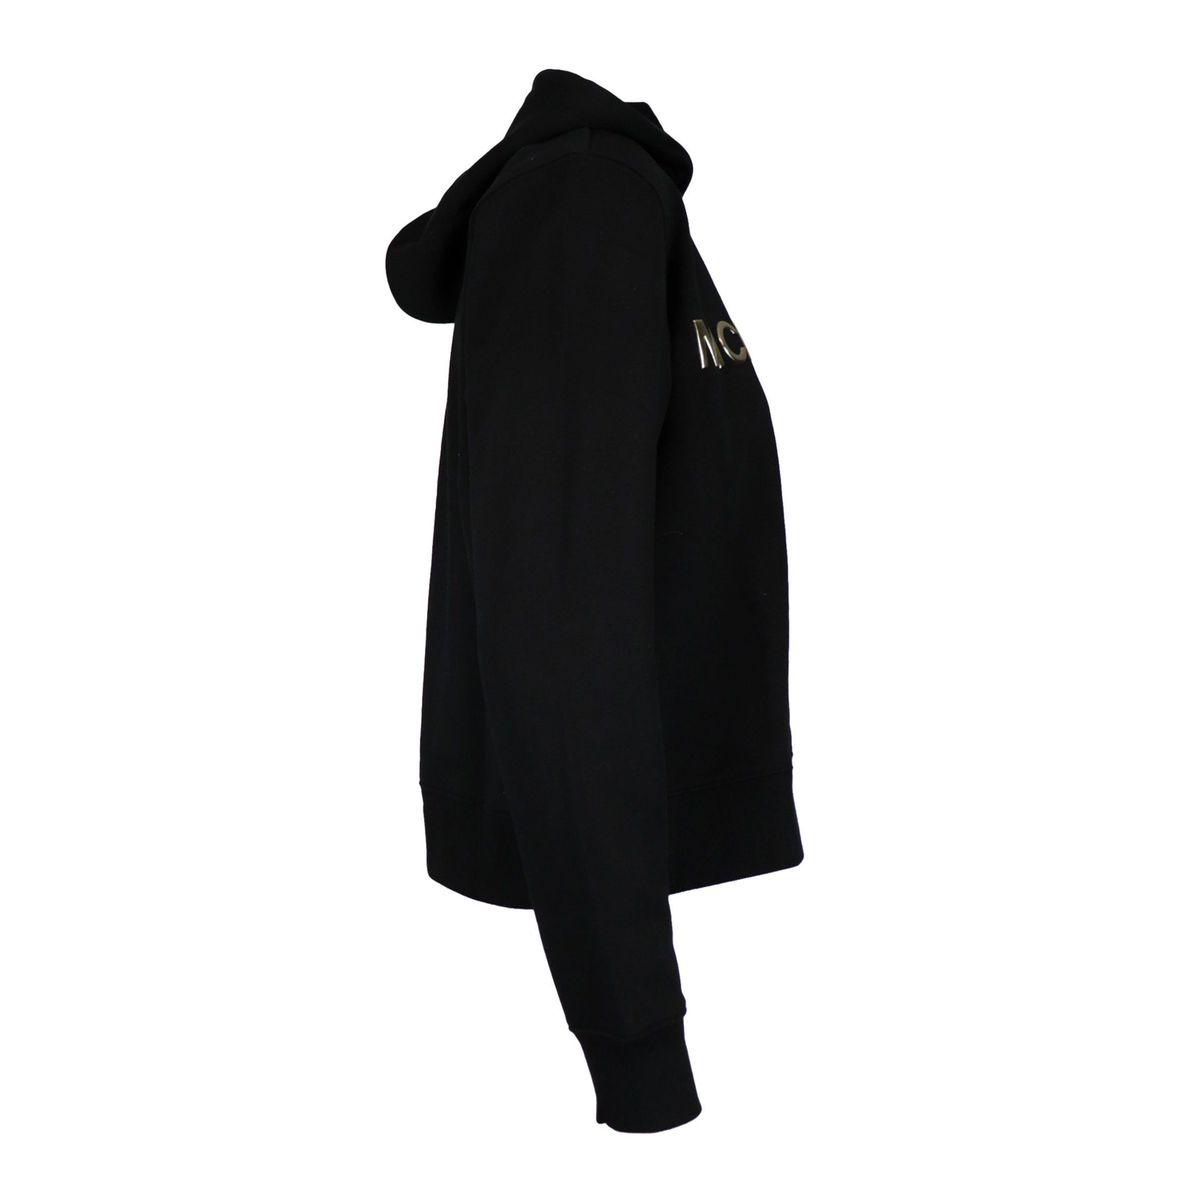 Cotton blend sweatshirt with hood and logo writing Black Michael Kors